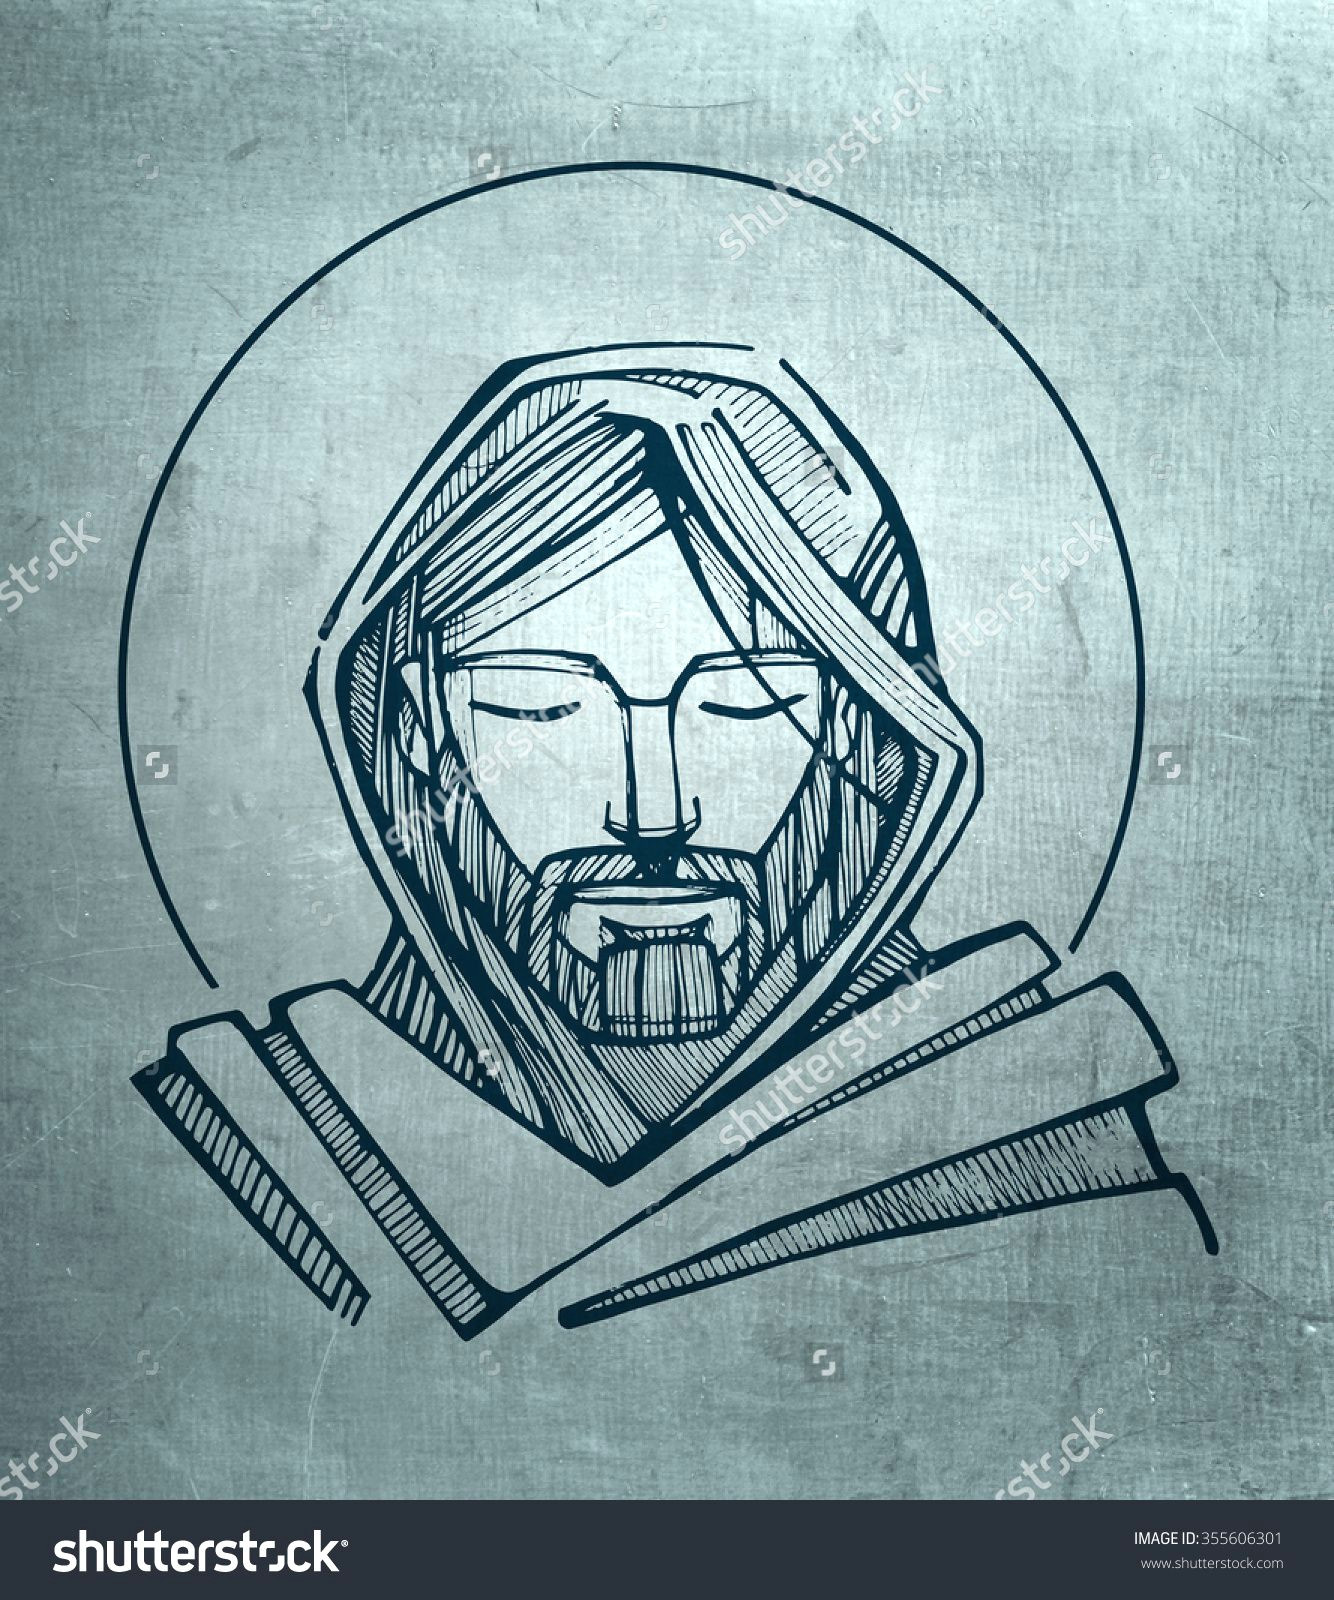 hand drawn illustration or drawing of jesus christ serene face 355606301 shutterstock